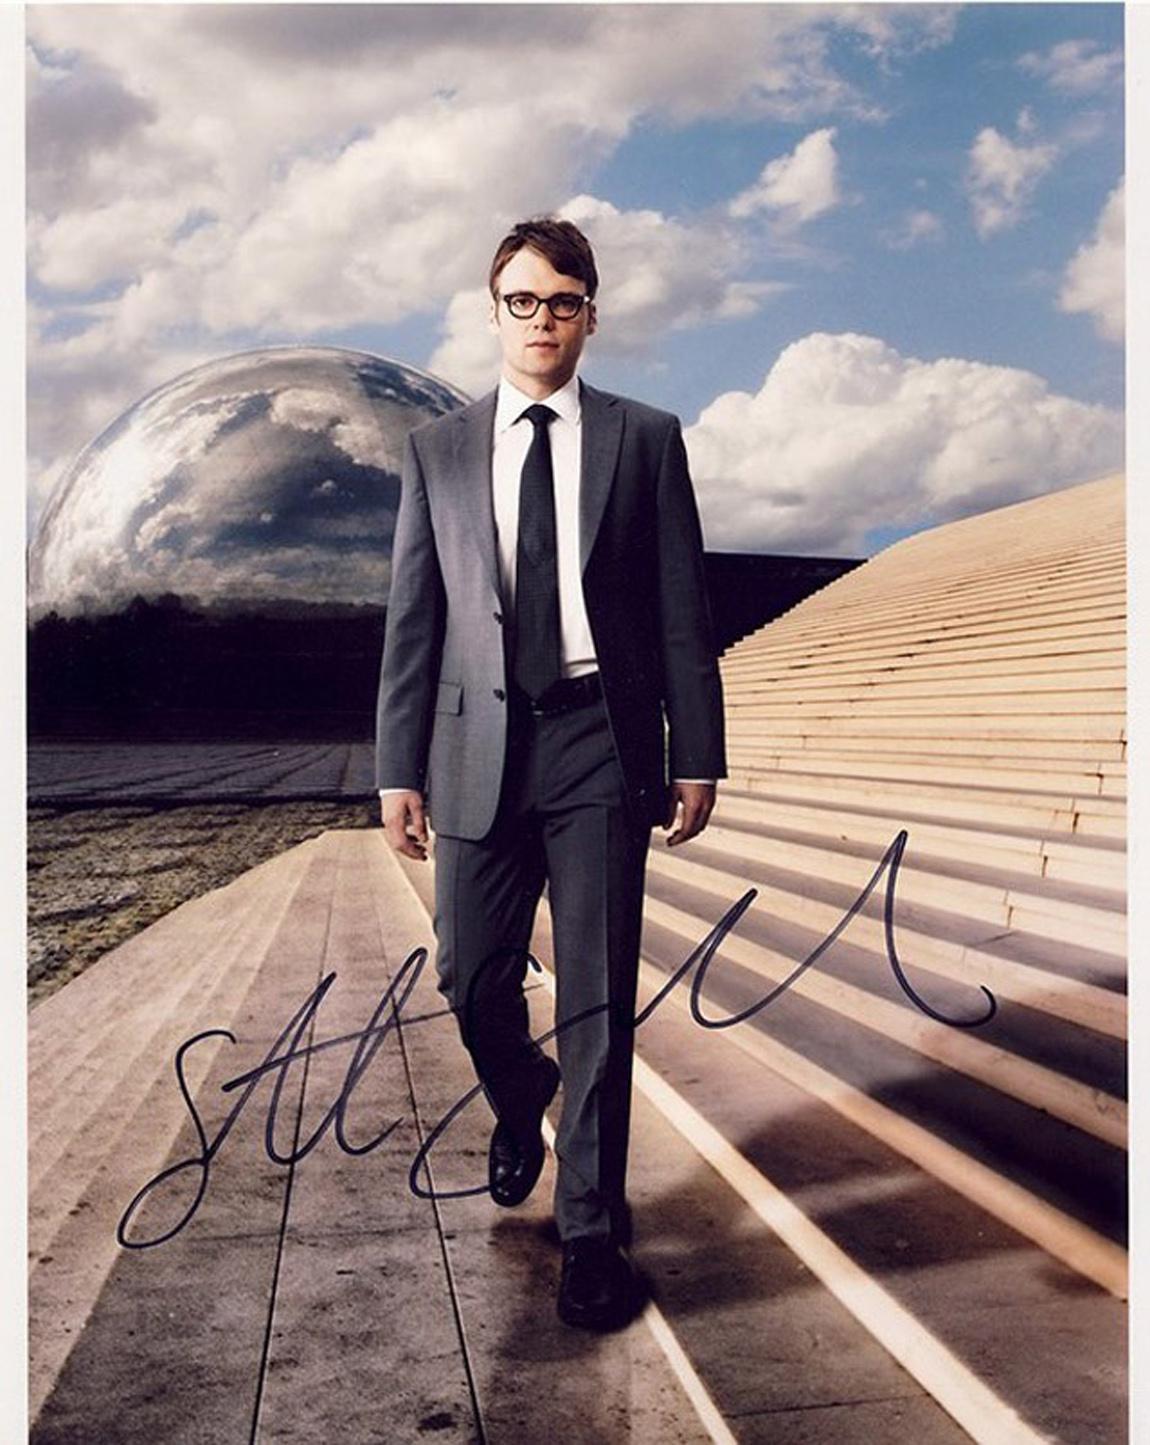 Blowout Sale! Fringe Seth Gabel hand signed 10x8 photo. This beautiful 10x8 hand signed photo